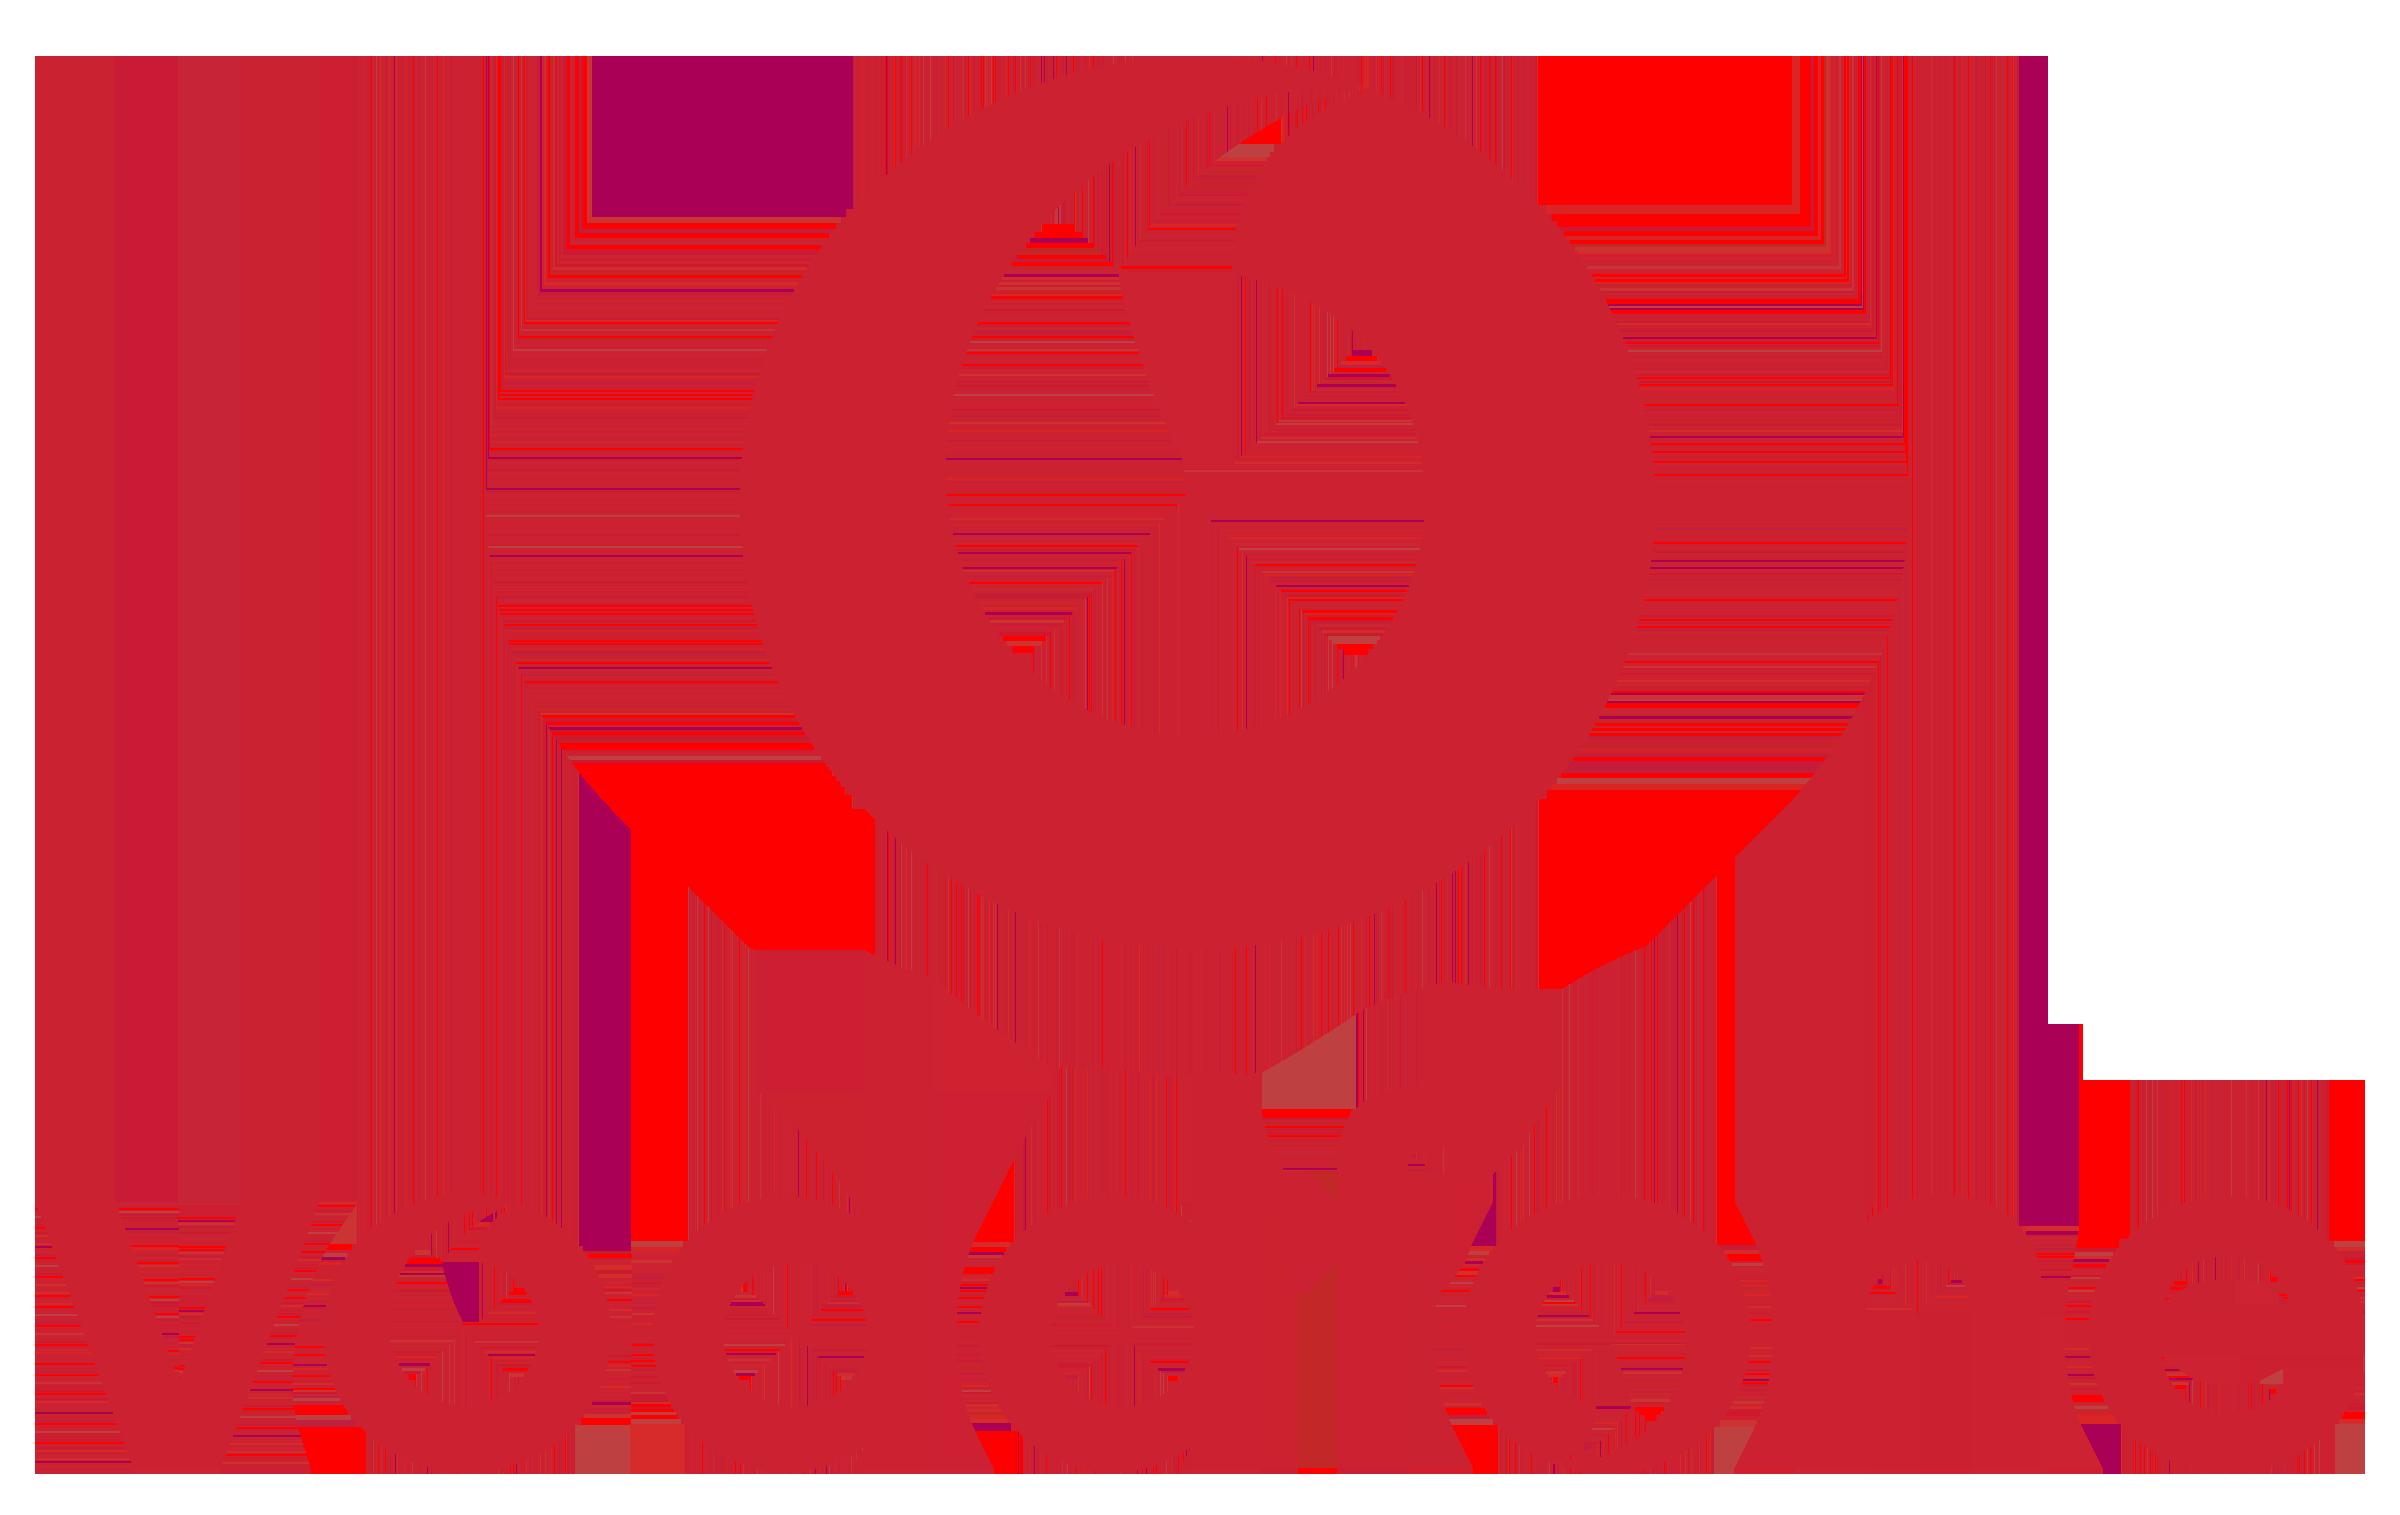 vodafone-8-logo-png-transparent copy.png